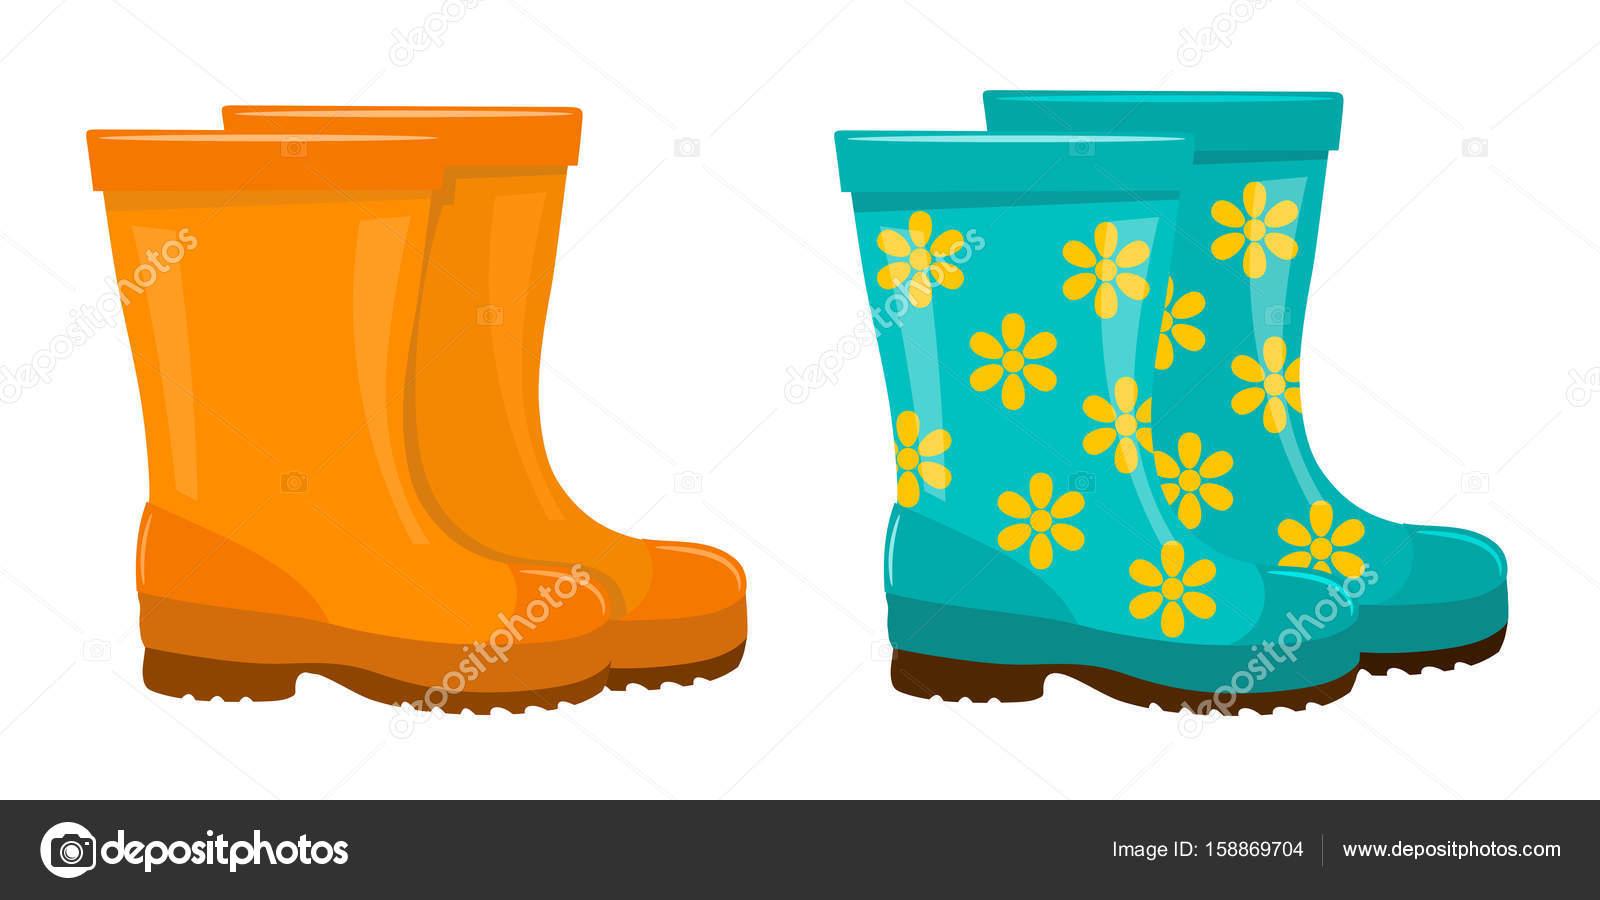 da07dac80dd Conjunto de botas de borracha coloridas sobre um fundo branco. Vestuário de  — Vetor de